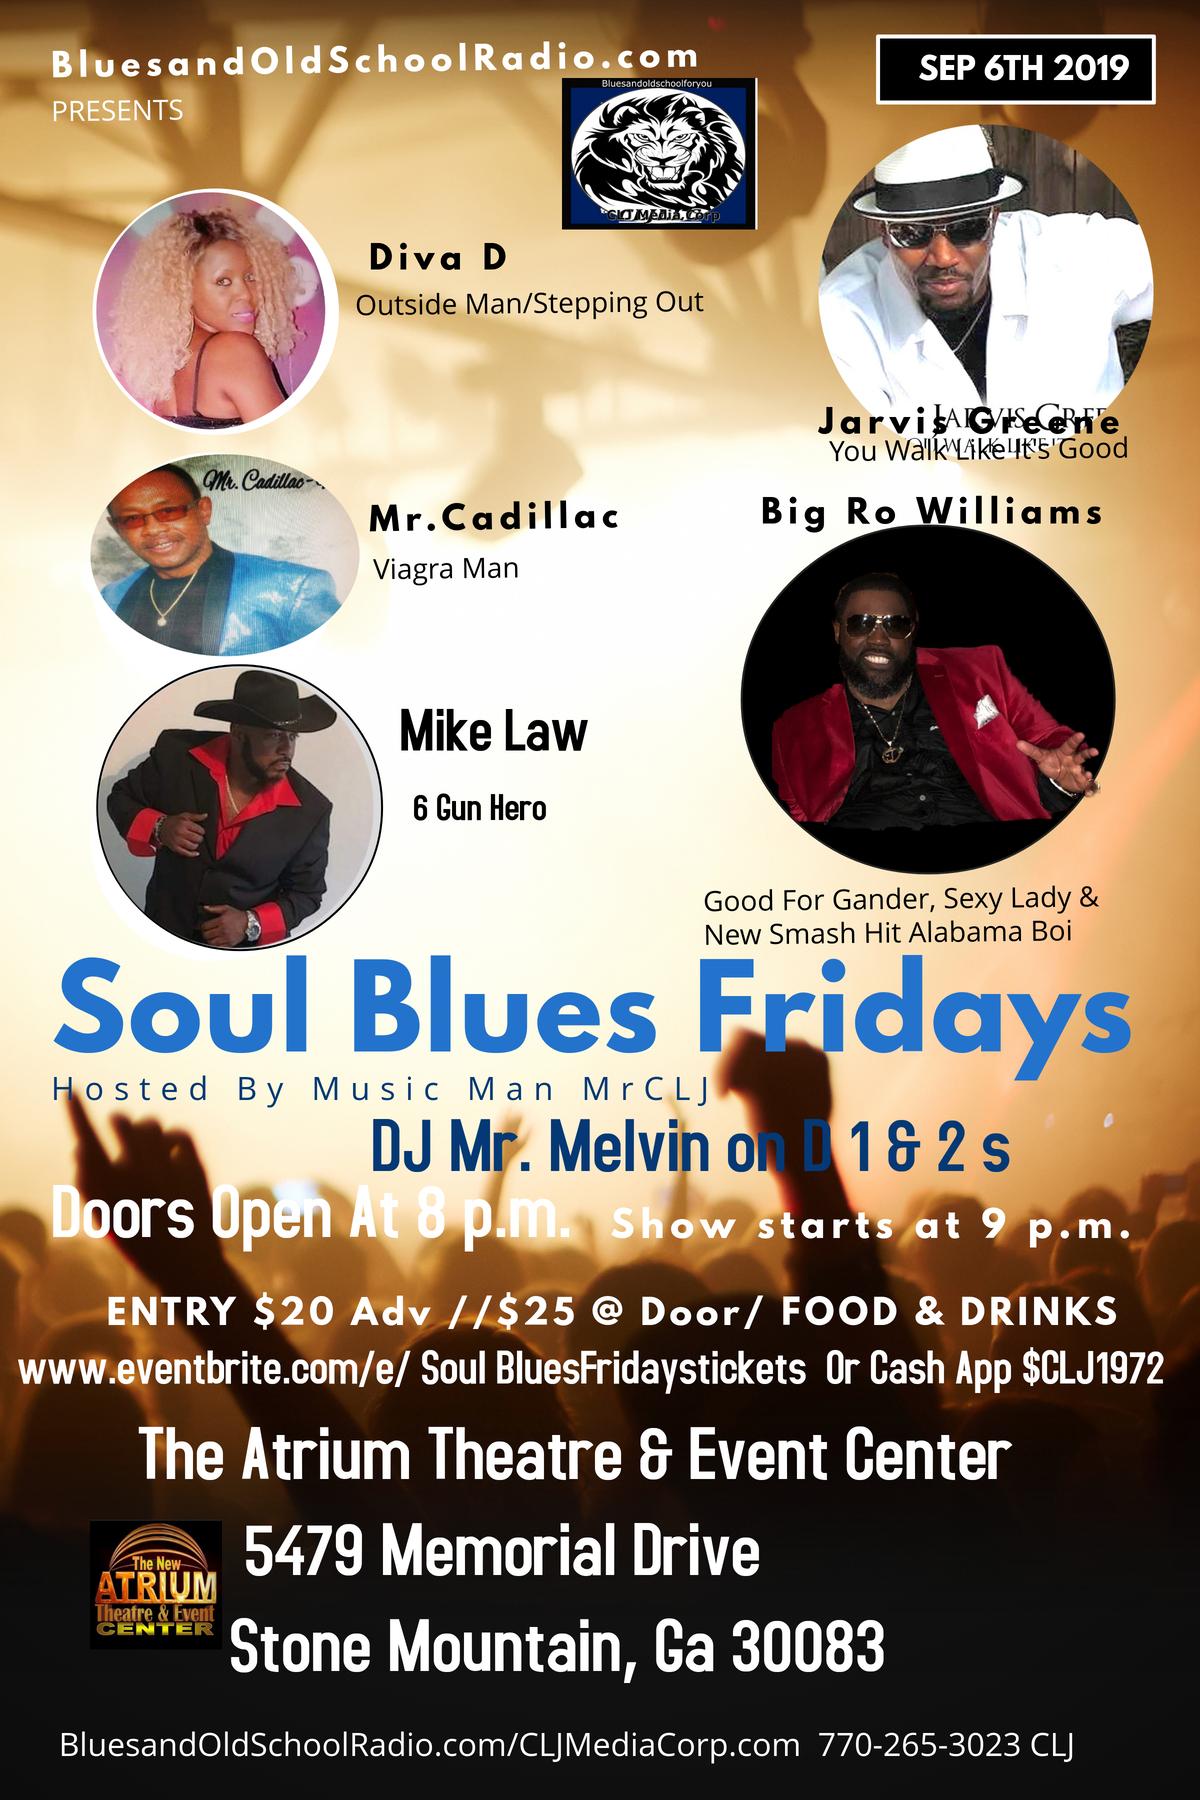 Soul Blues Fridays